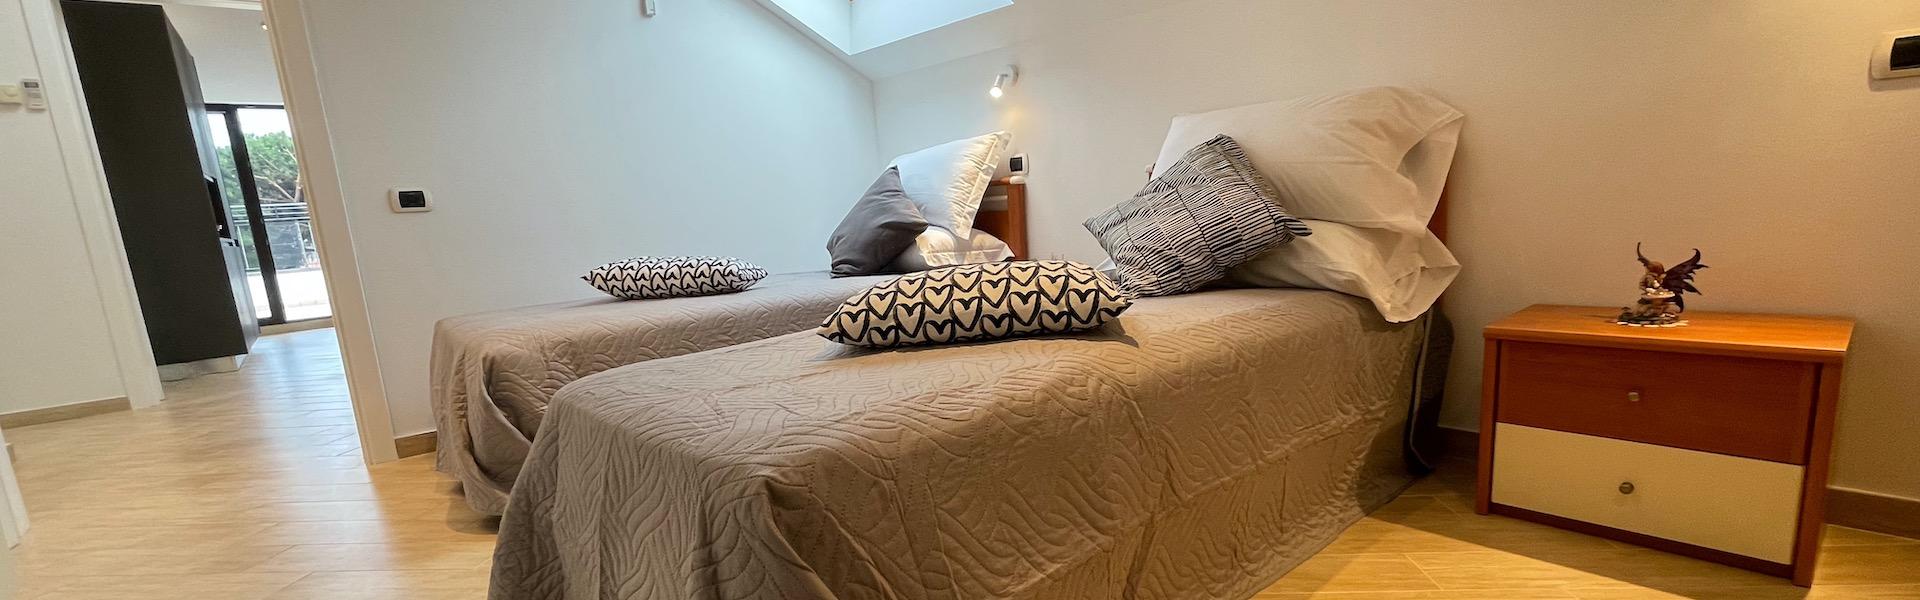 appartamento-mansarda4